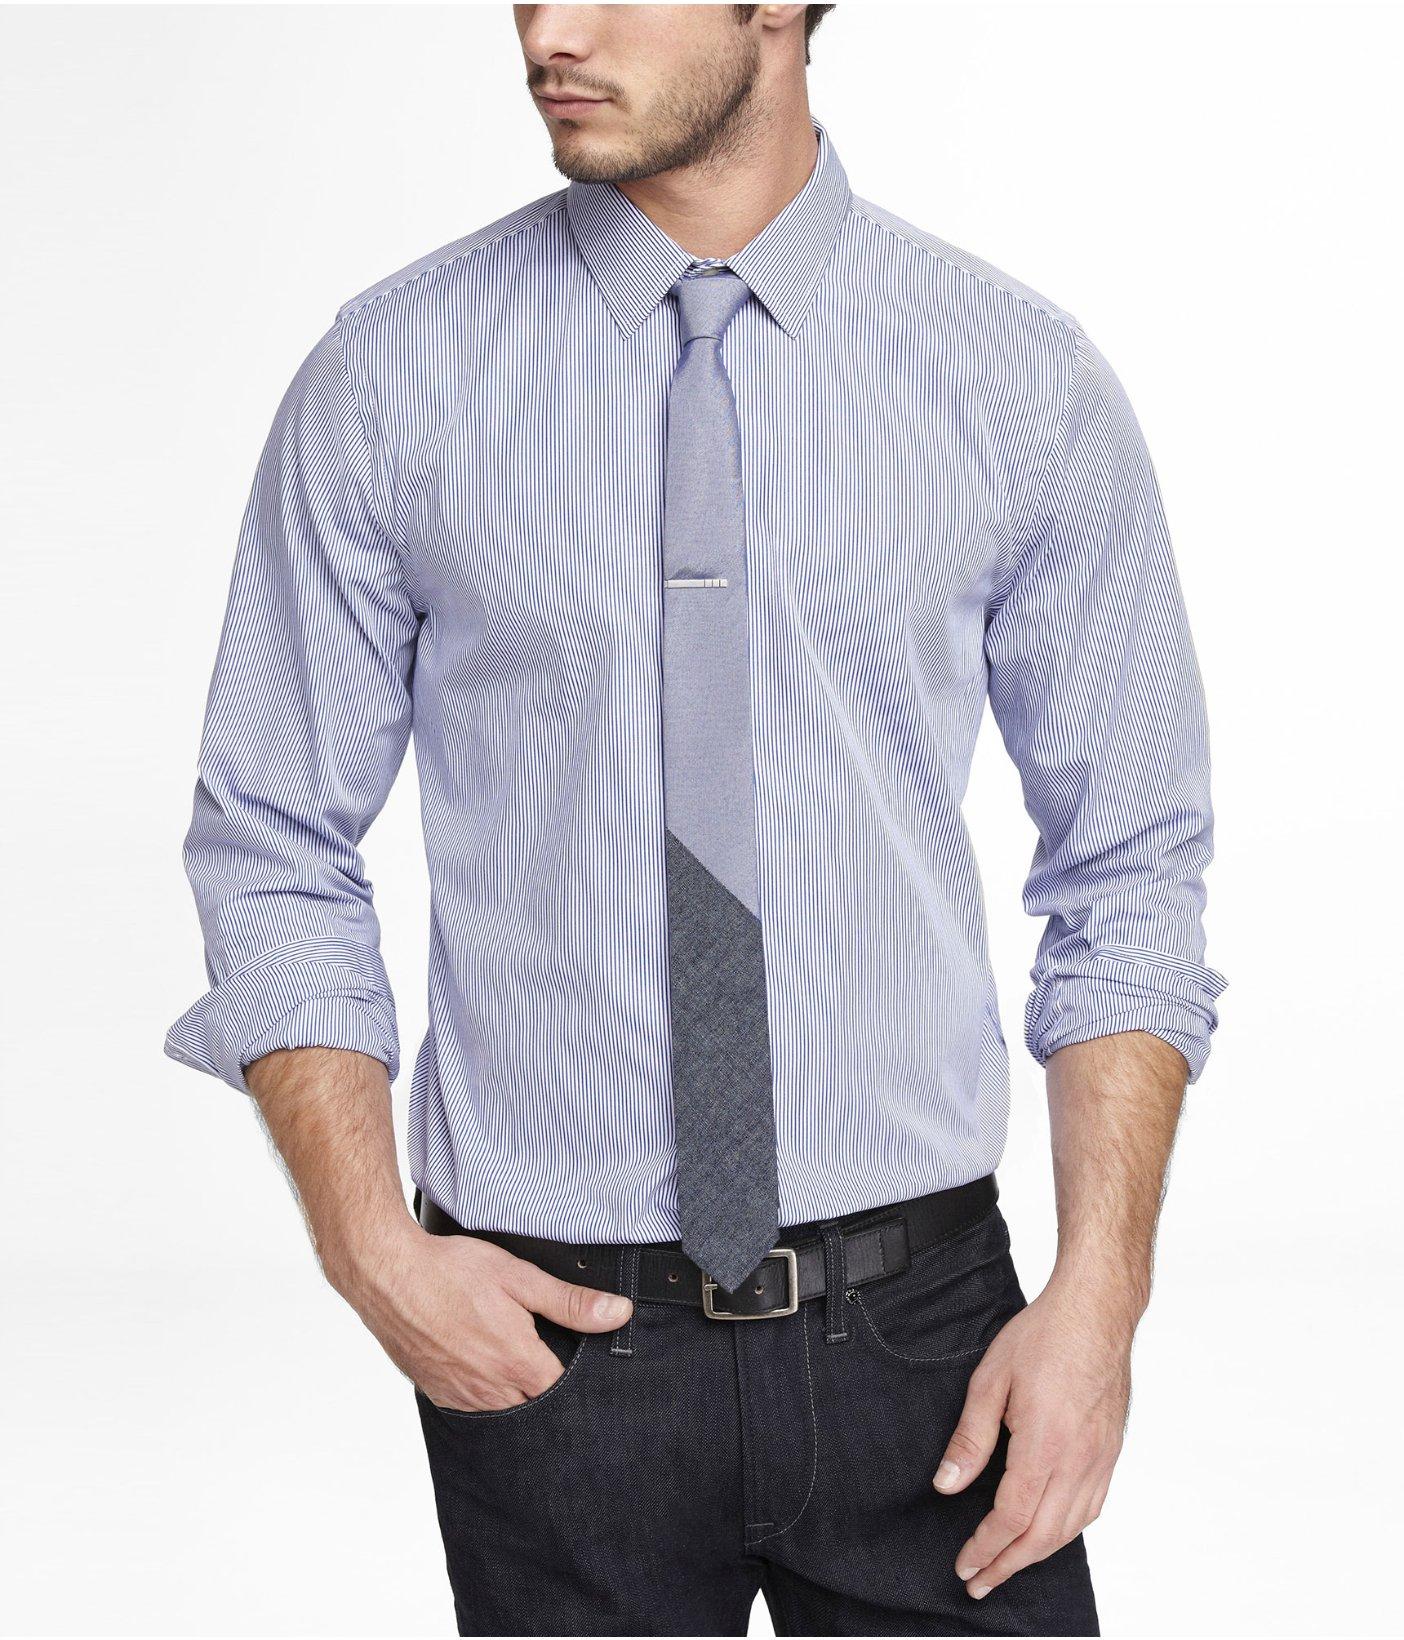 Express extra slim striped dress shirt in blue for men lyst for Extra slim dress shirt